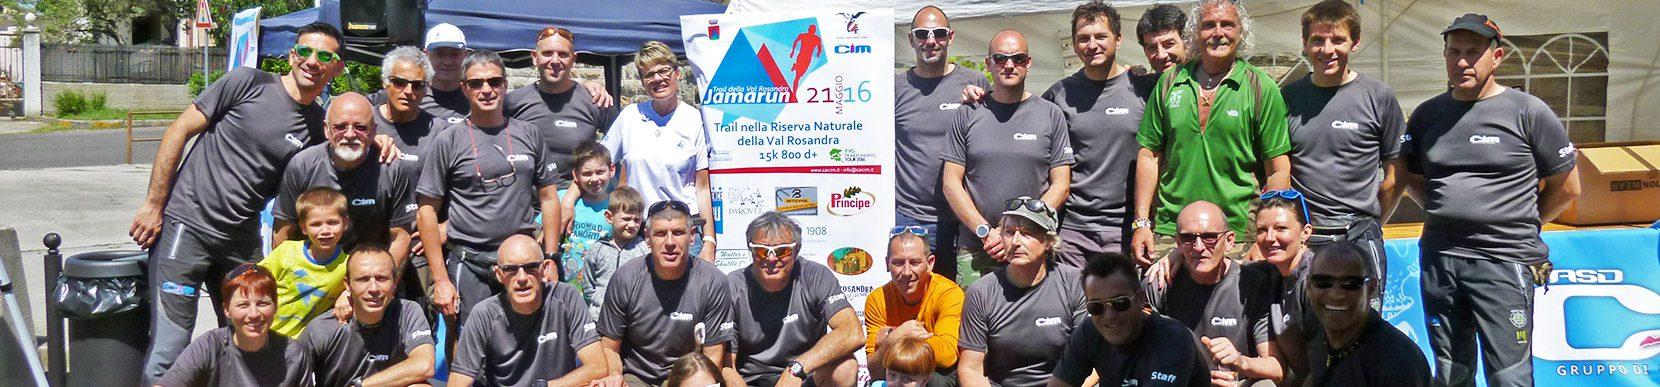 Gruppo Corsa in Montagna - CIM